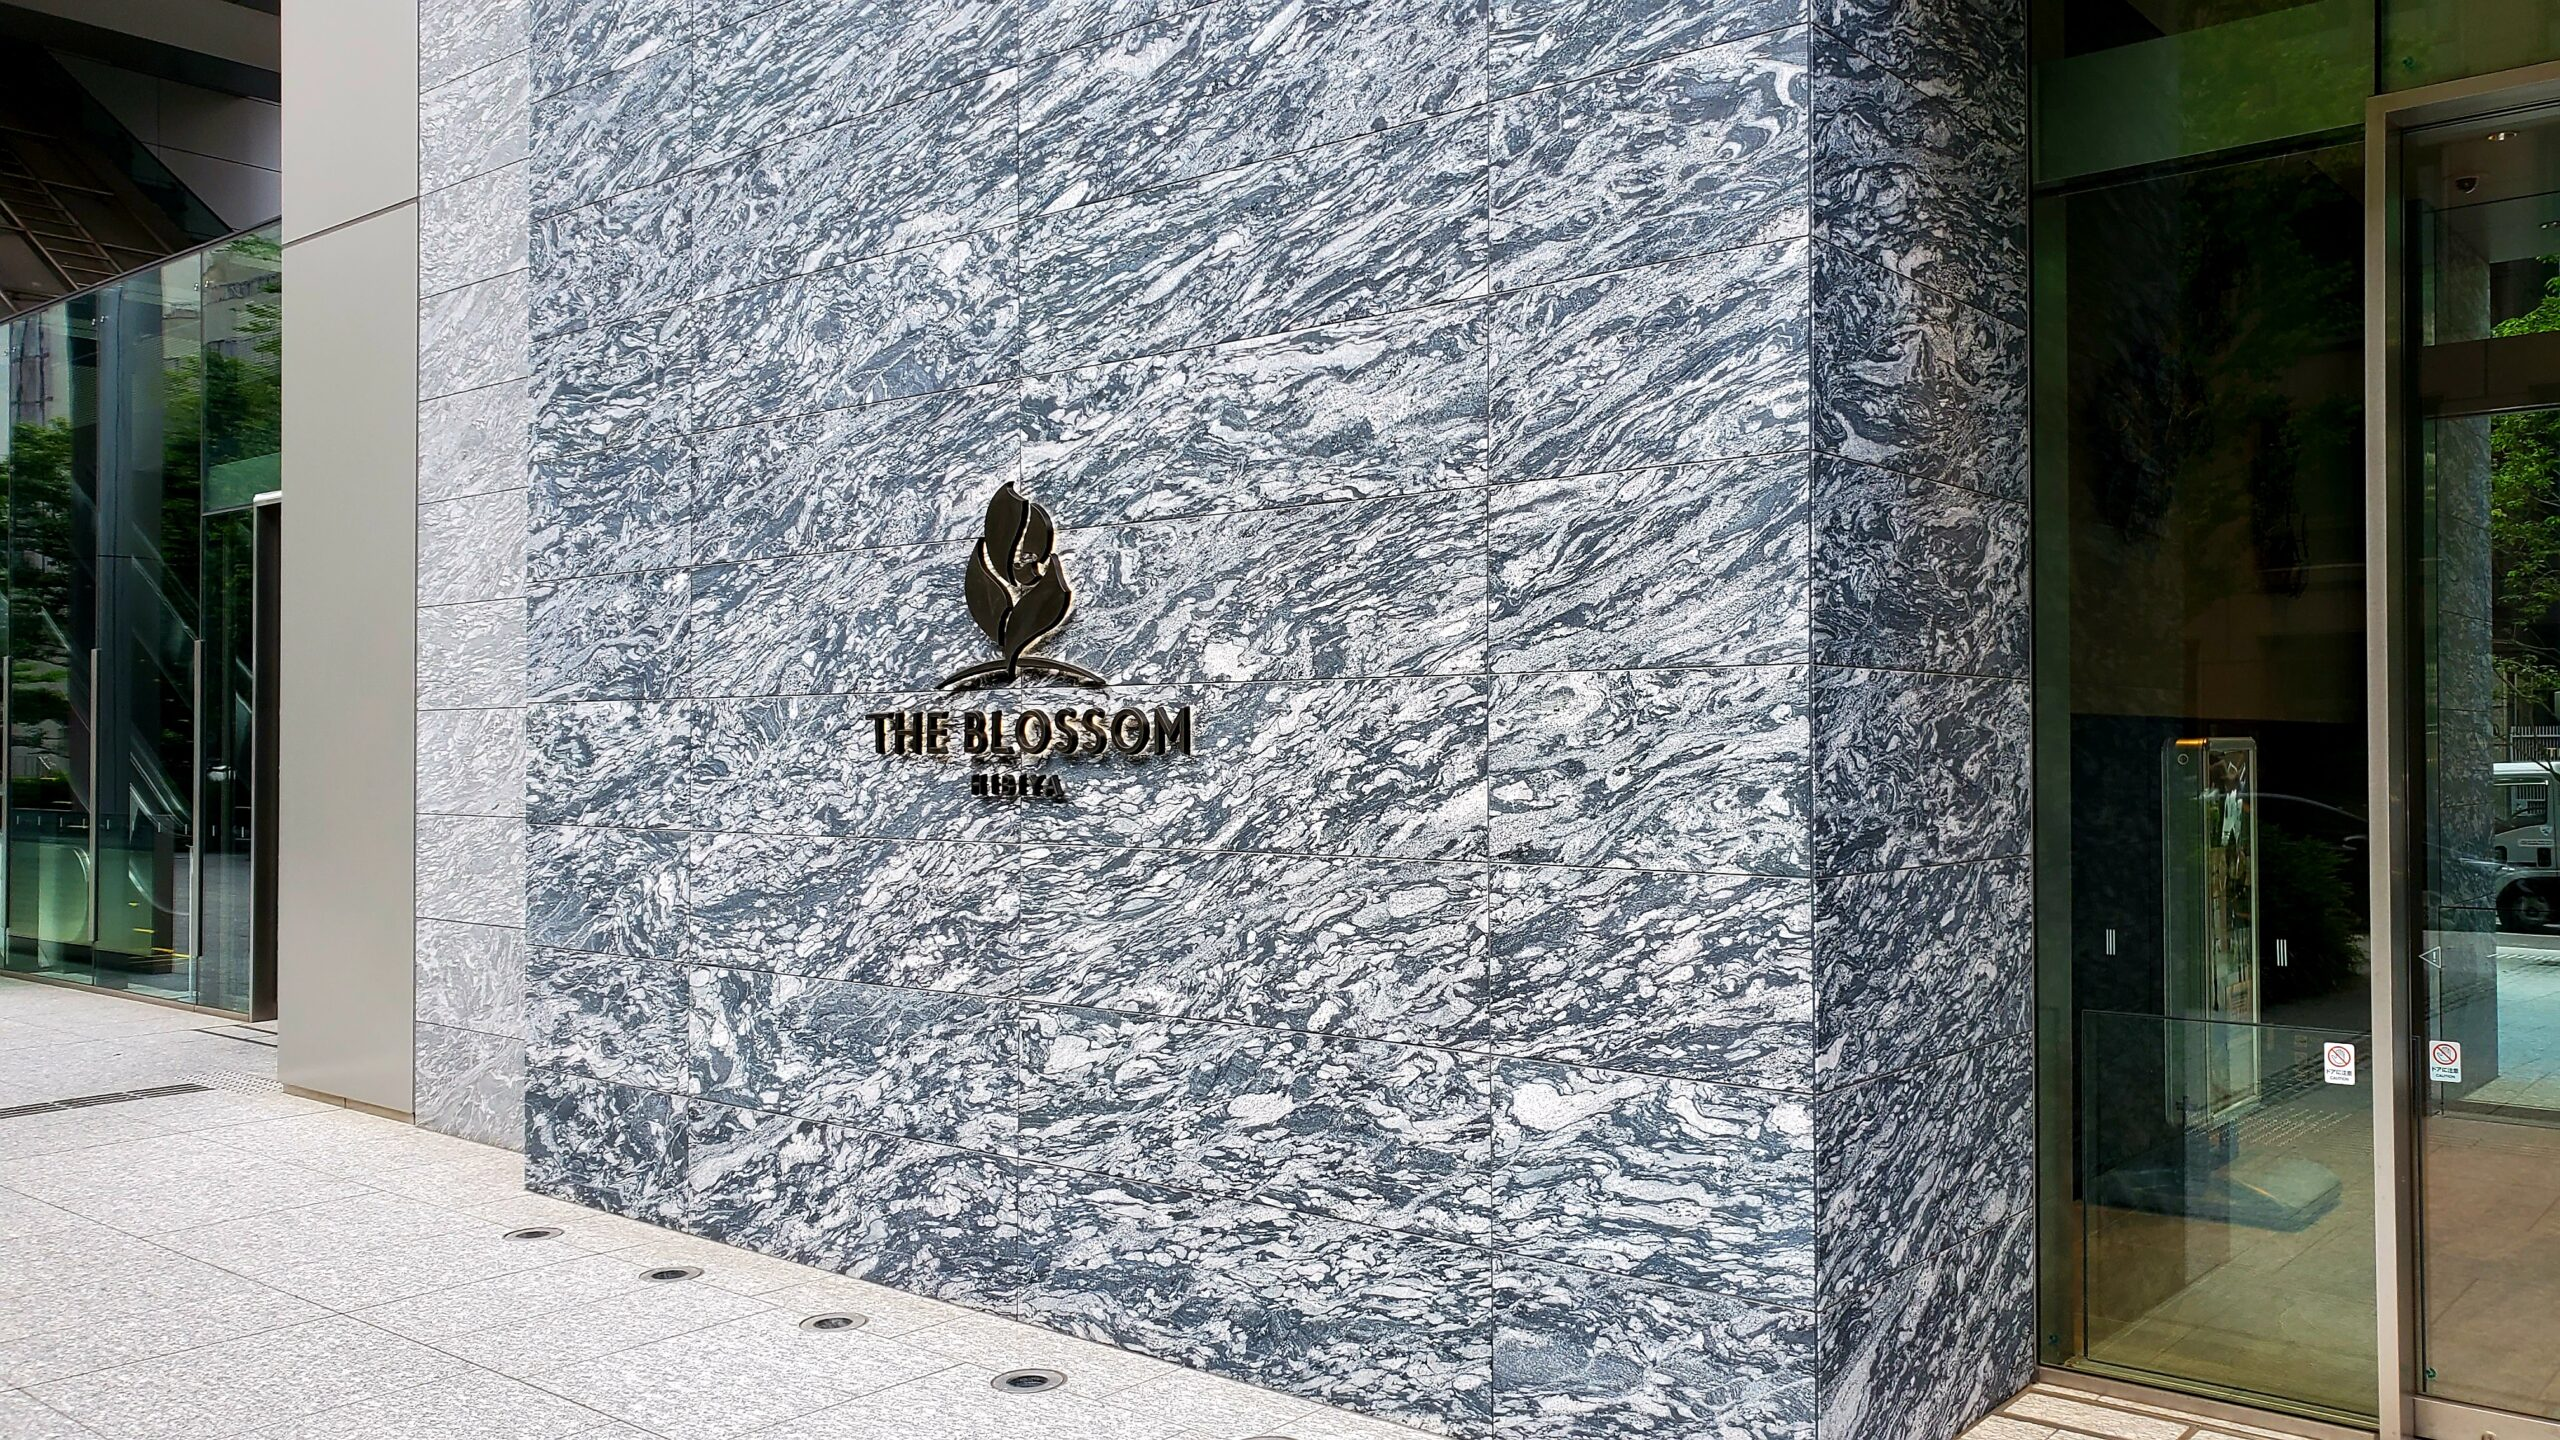 THE BLOSSOM HIBIYA(ザ ブラッサム 日比谷)